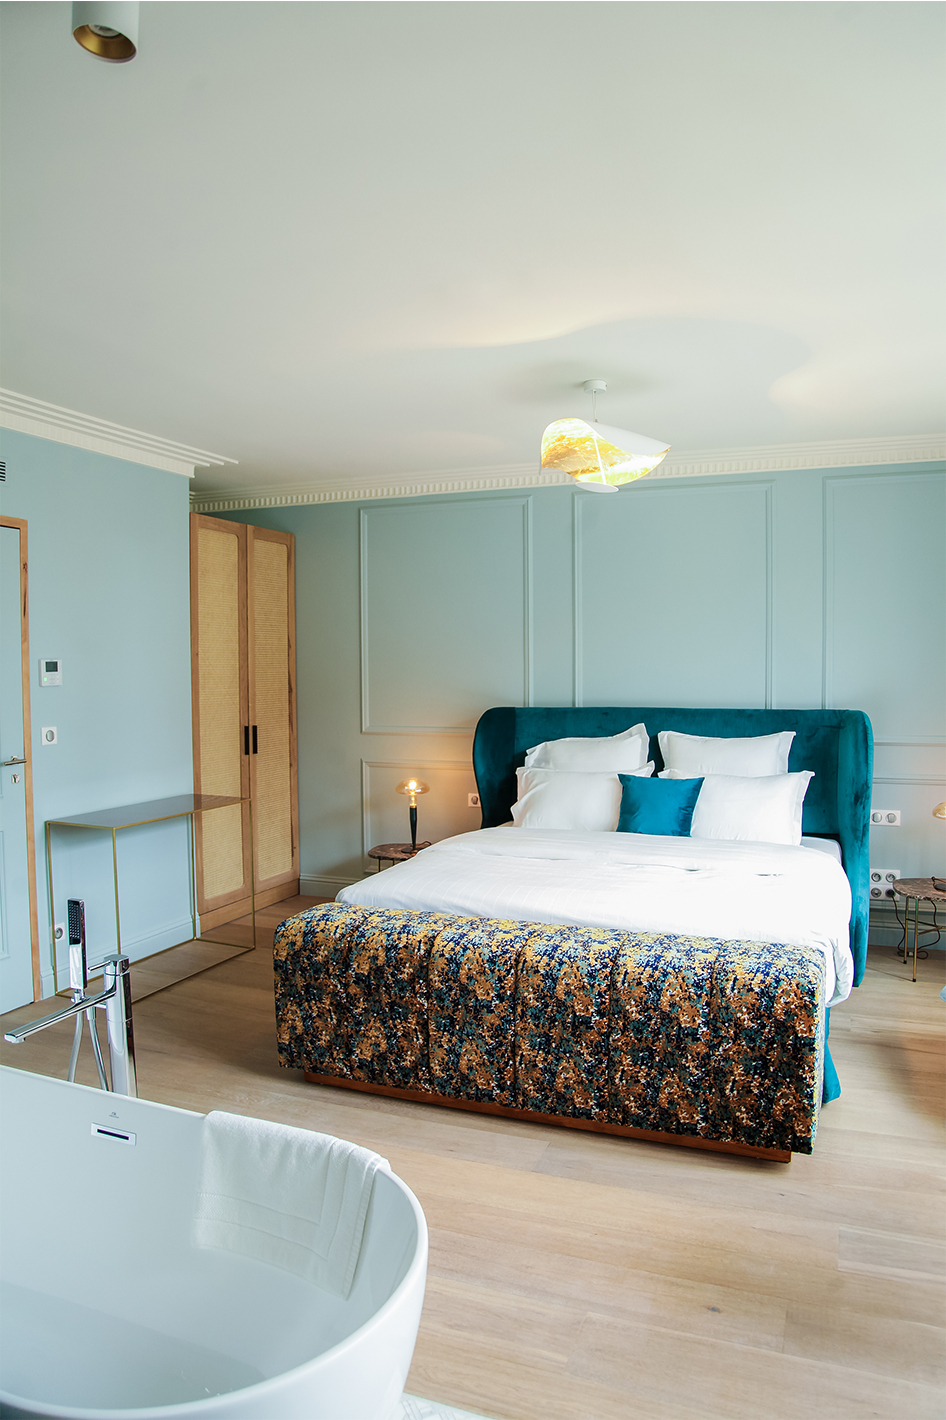 galerie2_0001_hotelsingulier-46